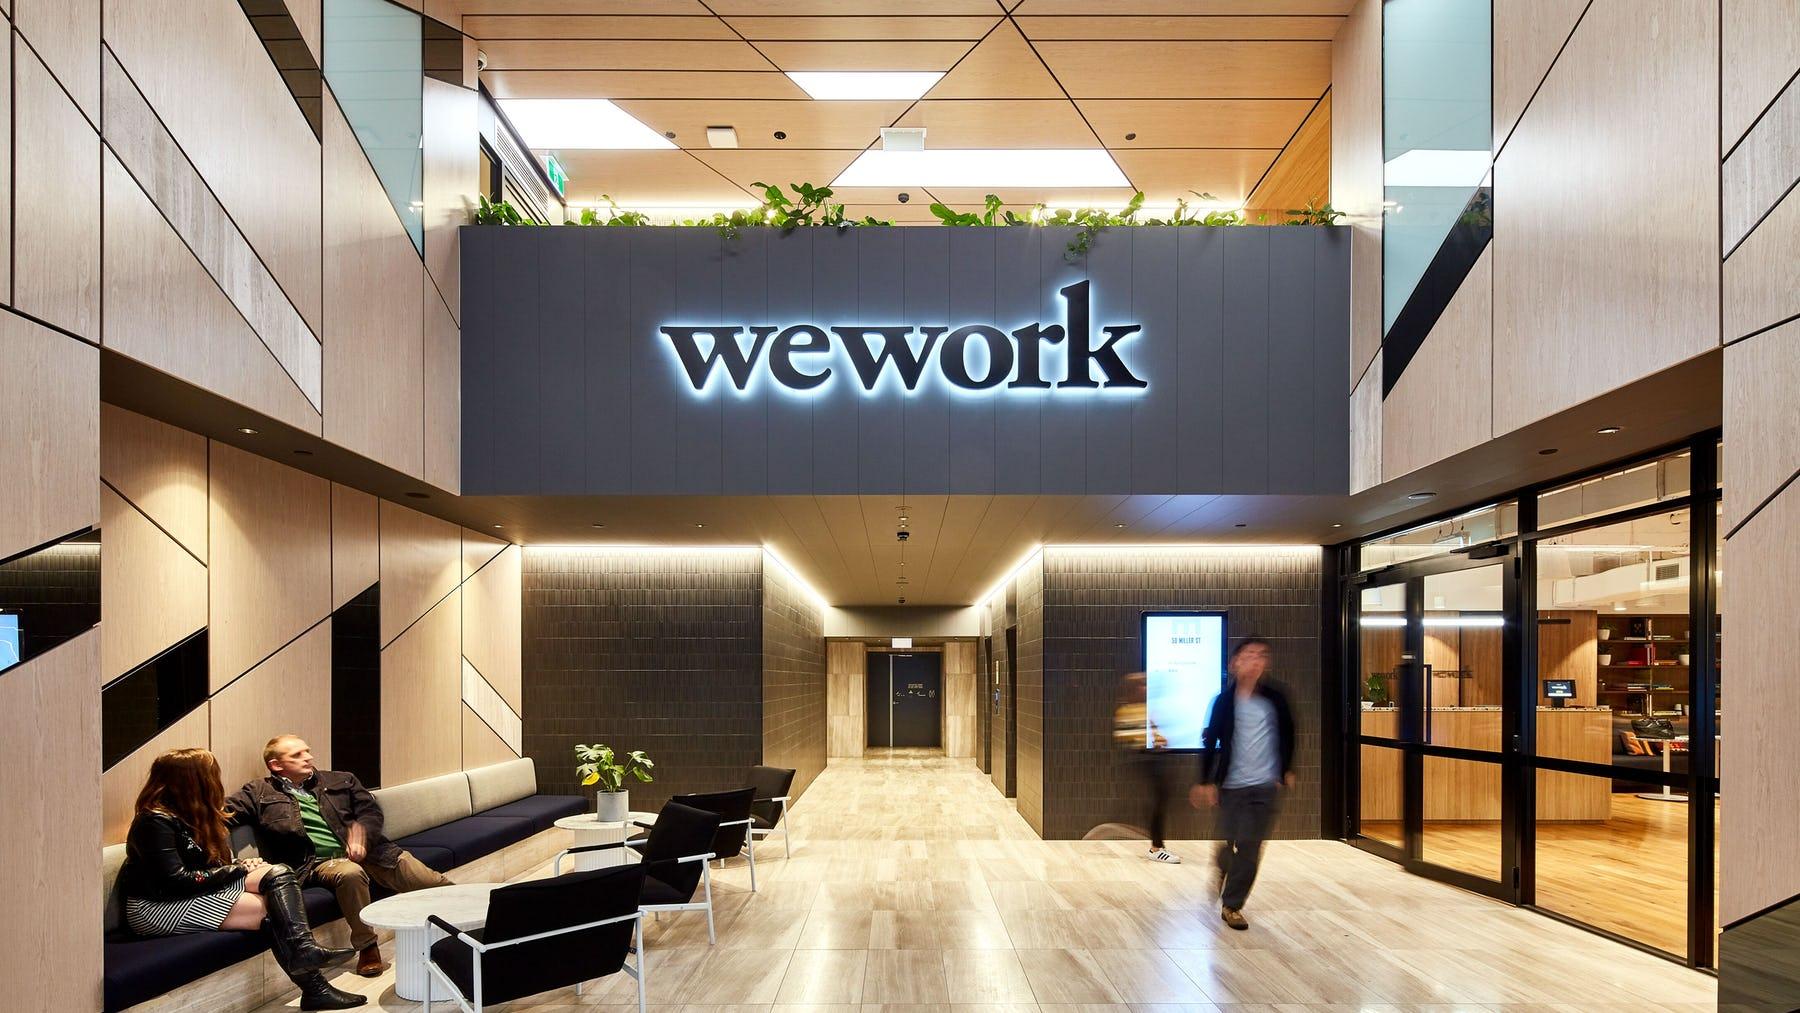 wework kripto para ile odeme kabul etmeye basladi